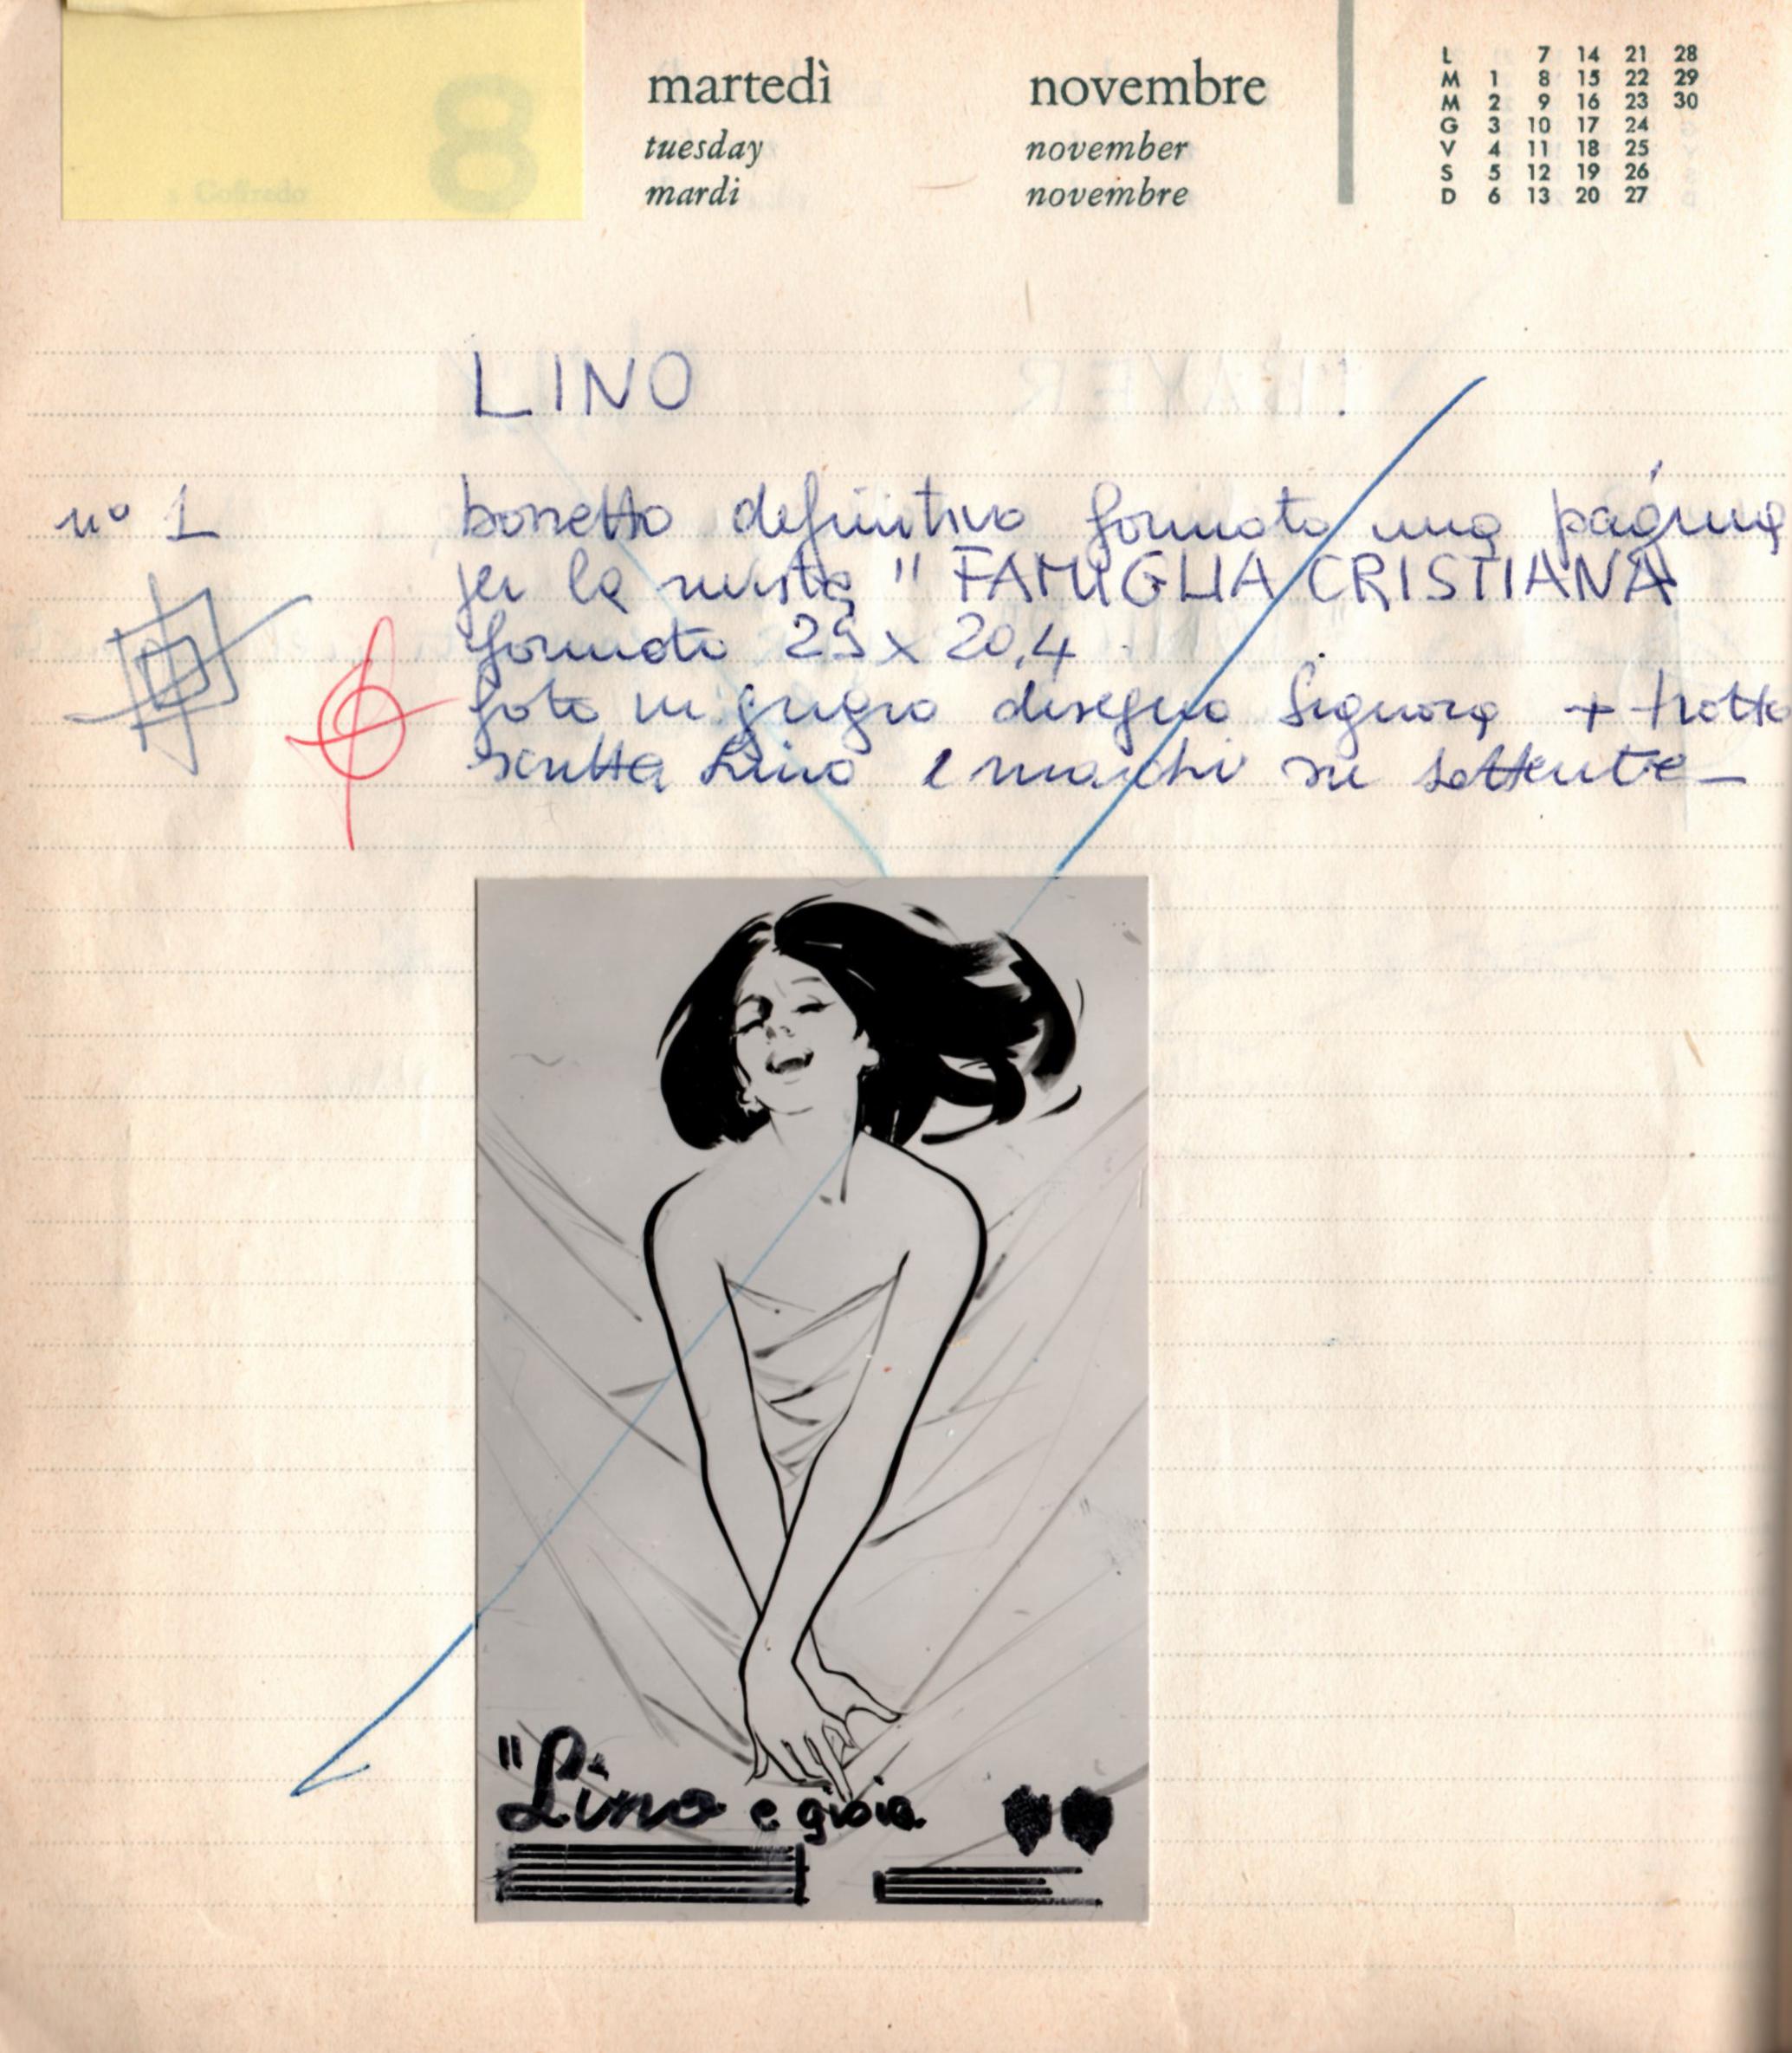 Franco & Jeanne Grignani, project sketch, 1964